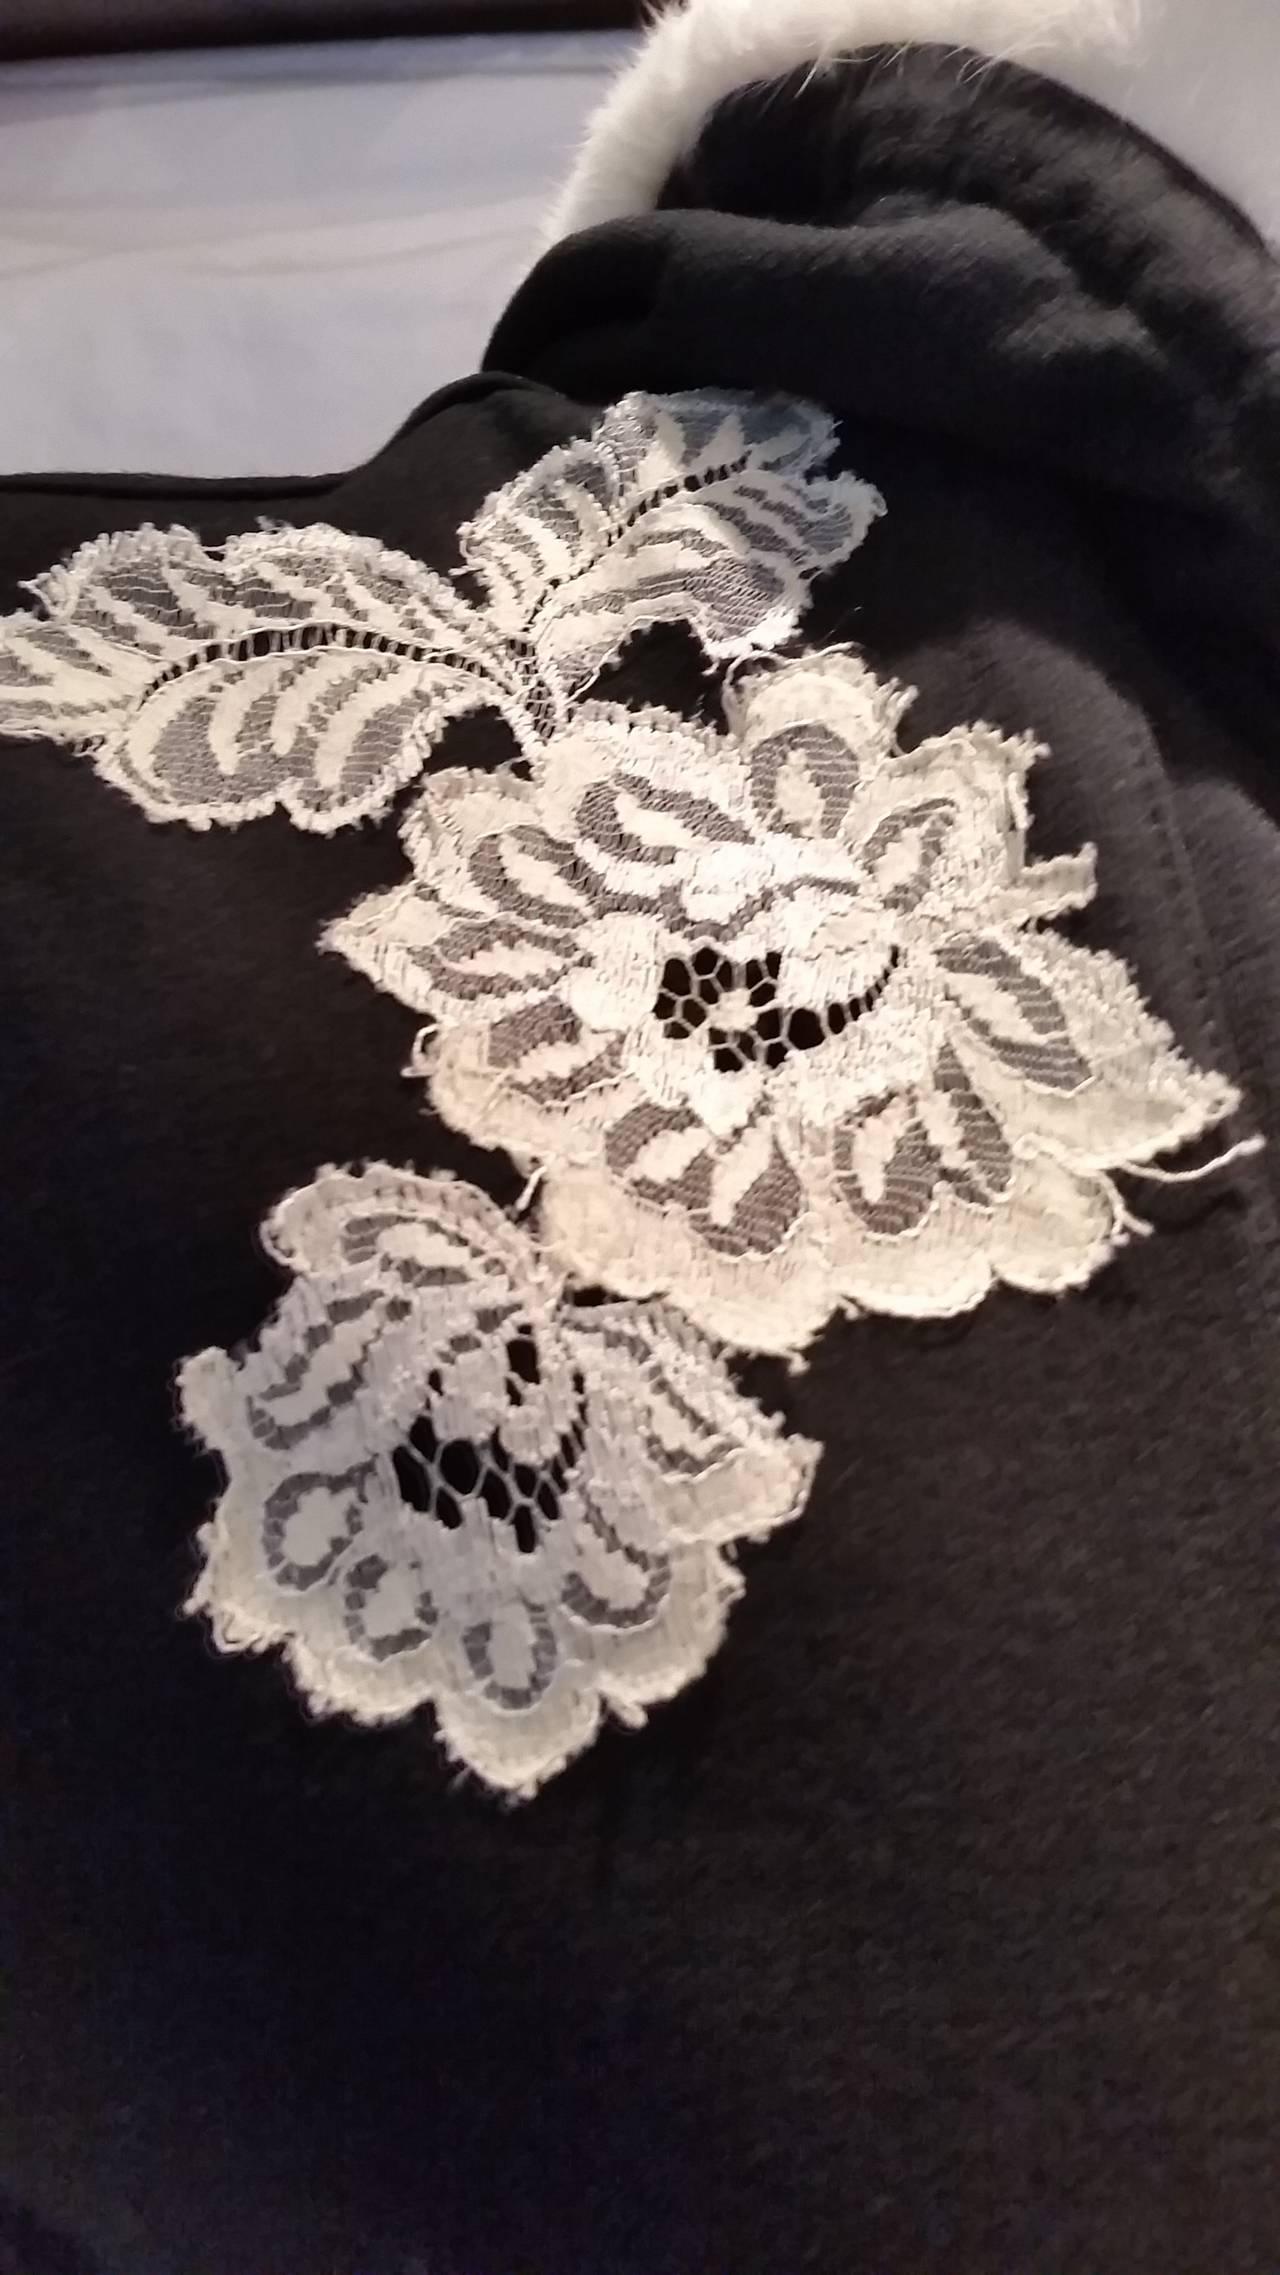 Black 2000s John Galliano black and white sweater For Sale